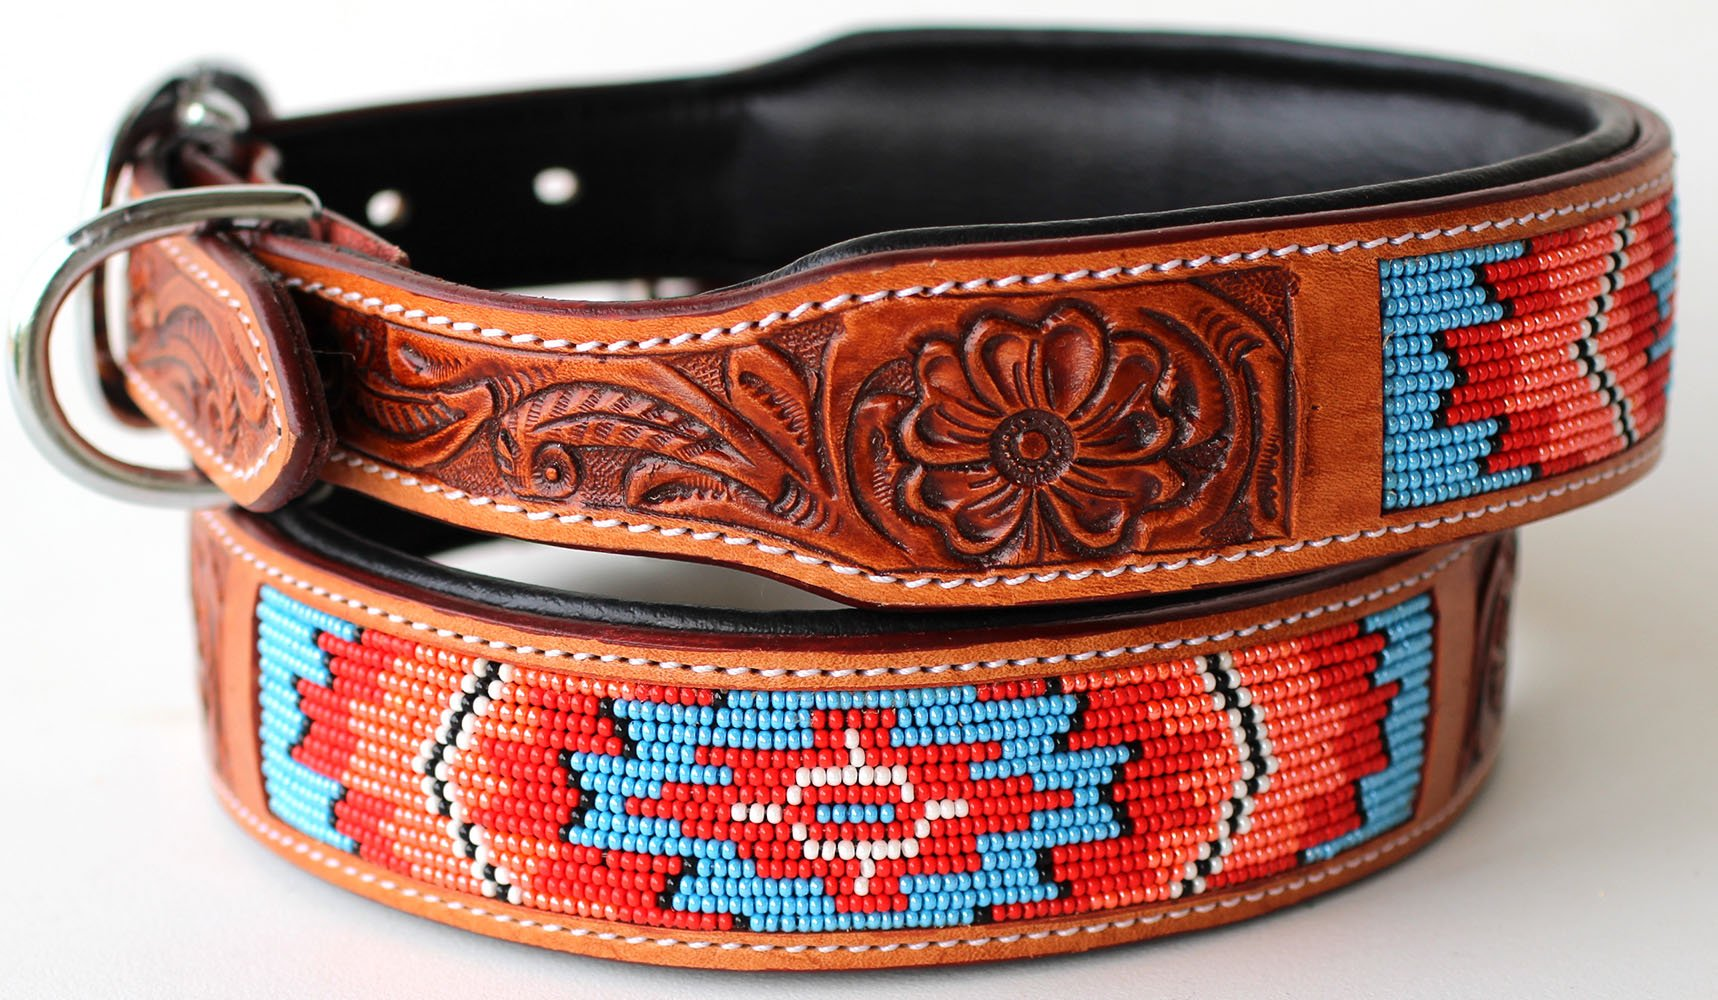 PRORIDER Medium 17''- 21'' Rhinestone Dog Puppy Collar Crystal Cow Leather 6053